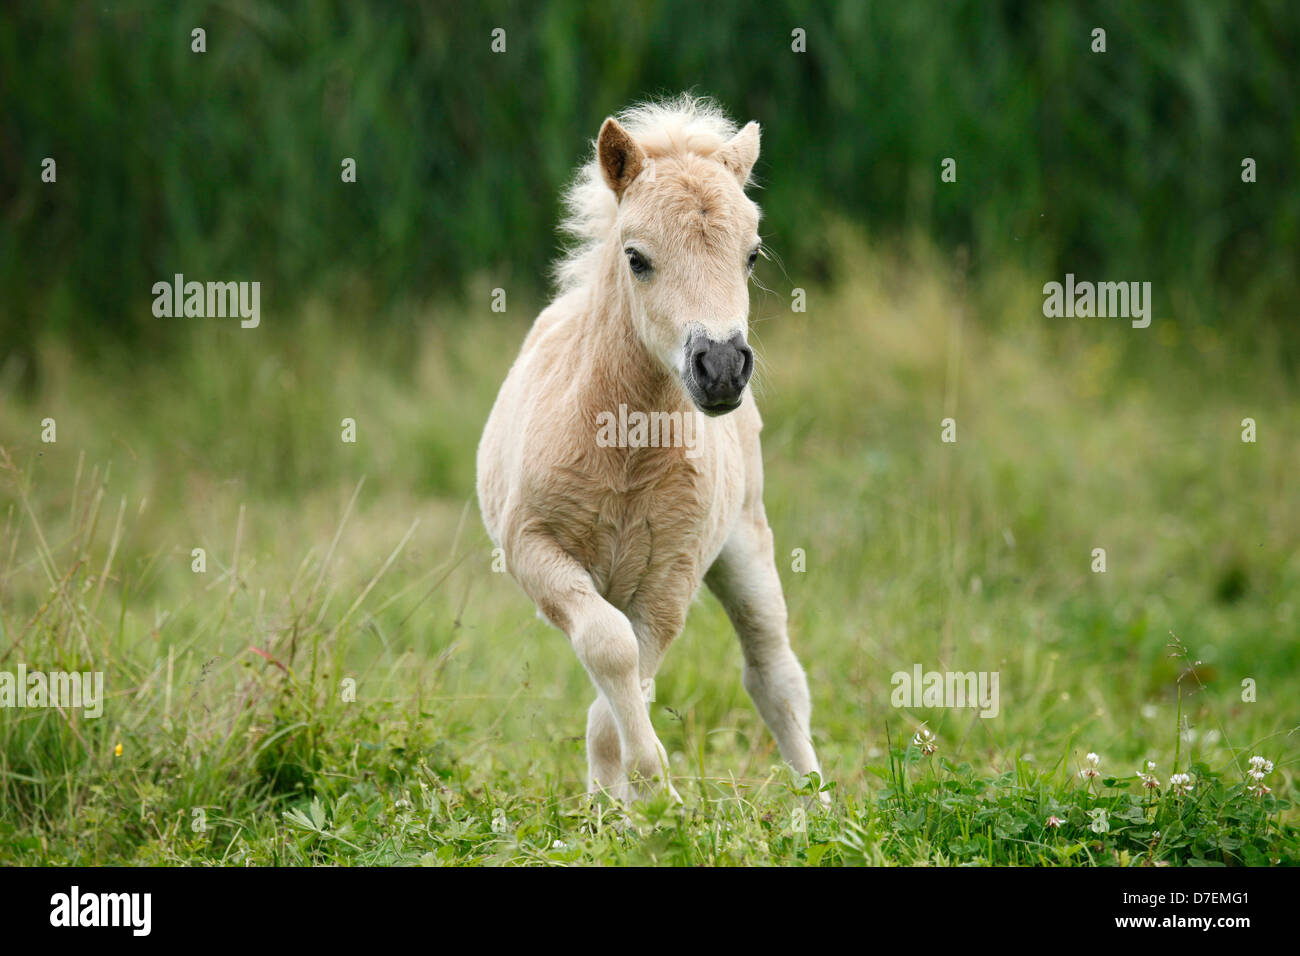 shetlandpony horse foal meadow stockfotos shetlandpony horse foal meadow bilder alamy. Black Bedroom Furniture Sets. Home Design Ideas